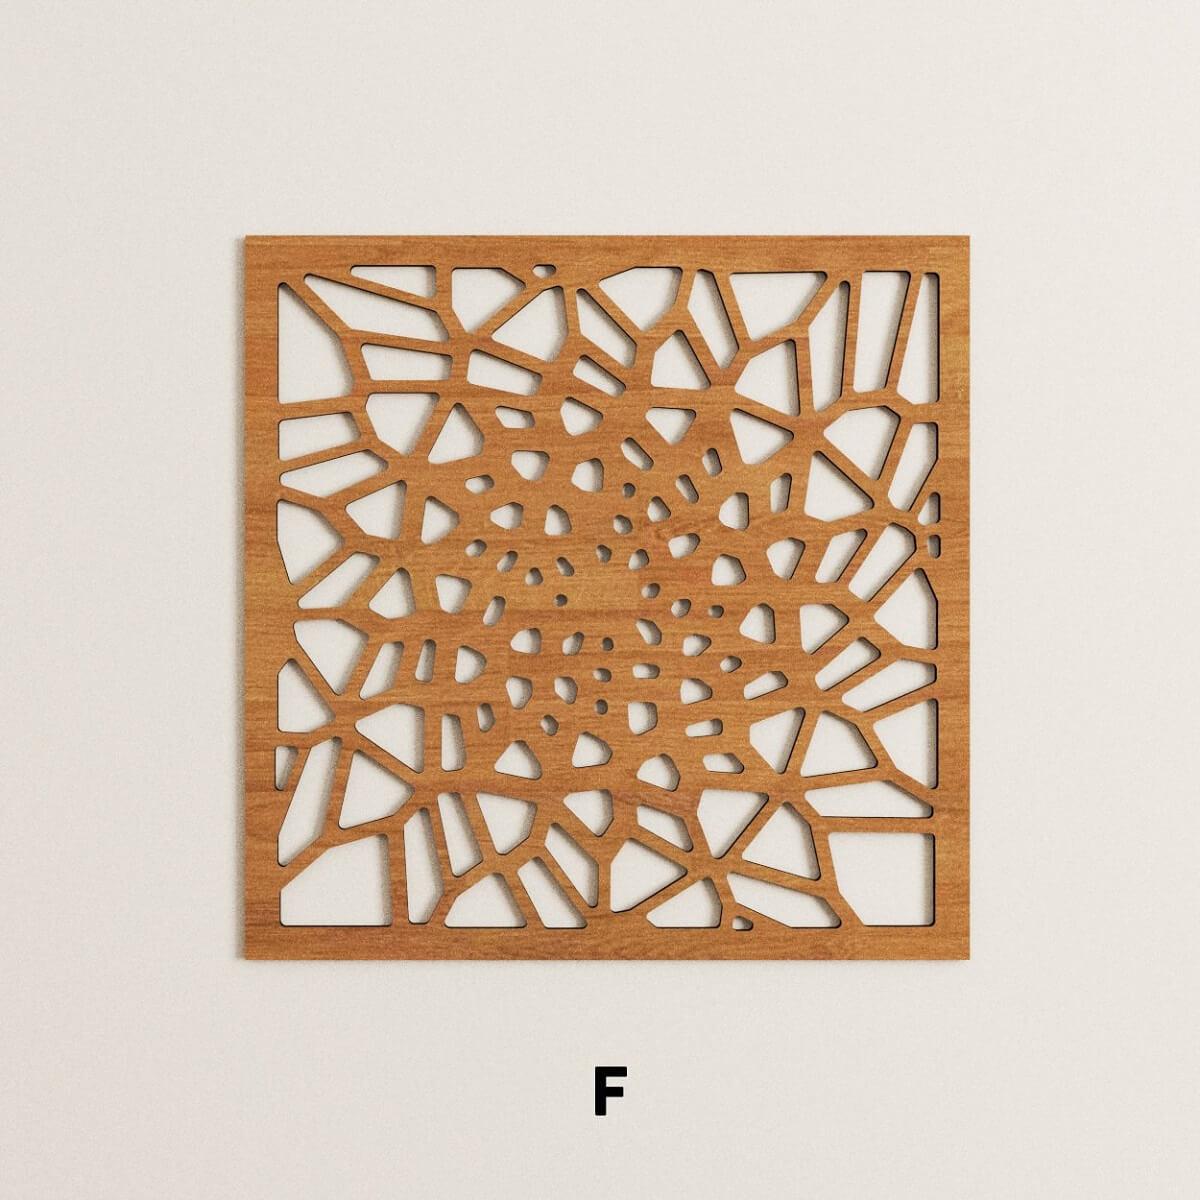 Parametric laser cut wooden panels